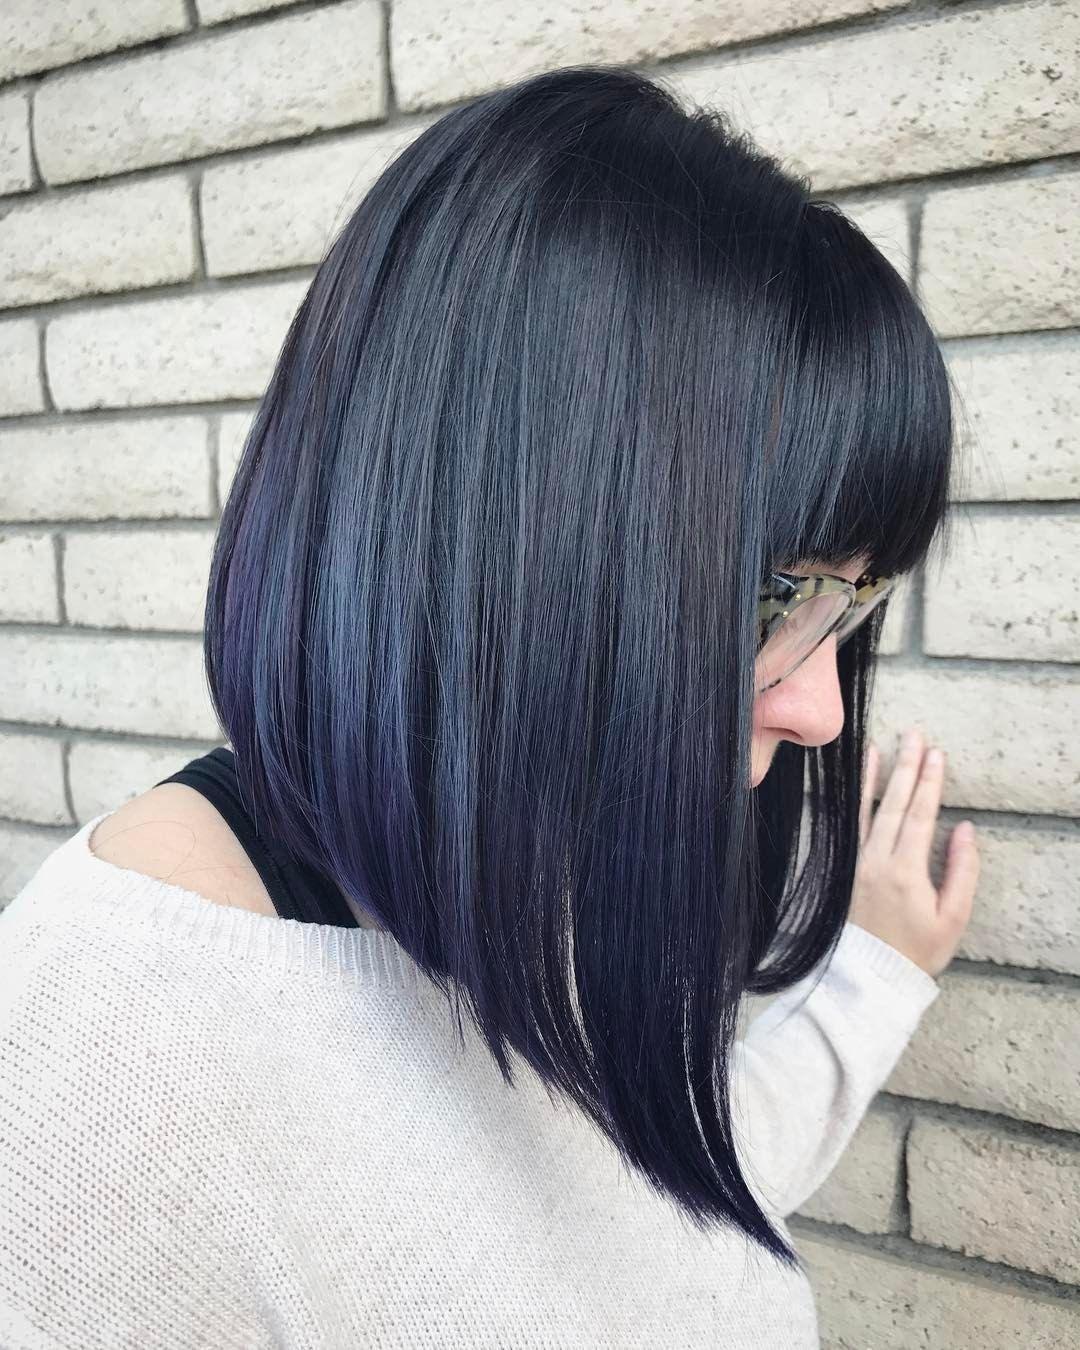 Midnight Blue Long Bob Haircut With Bangs Hair Styles Long Bob Haircuts